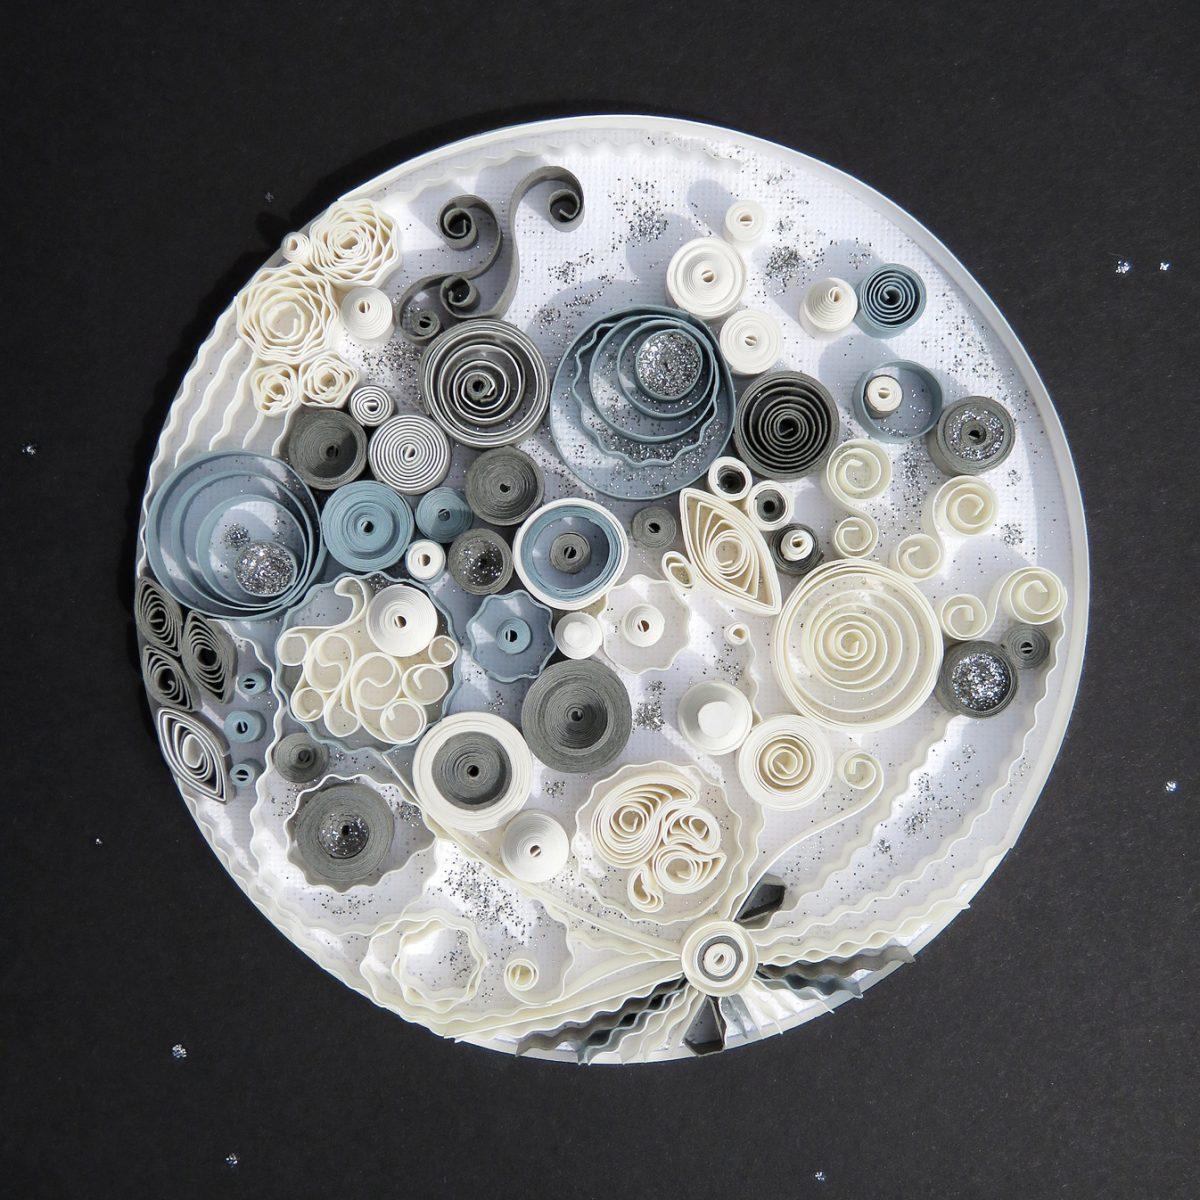 Buy Under The Same Moon Original Framed Quilled Paper